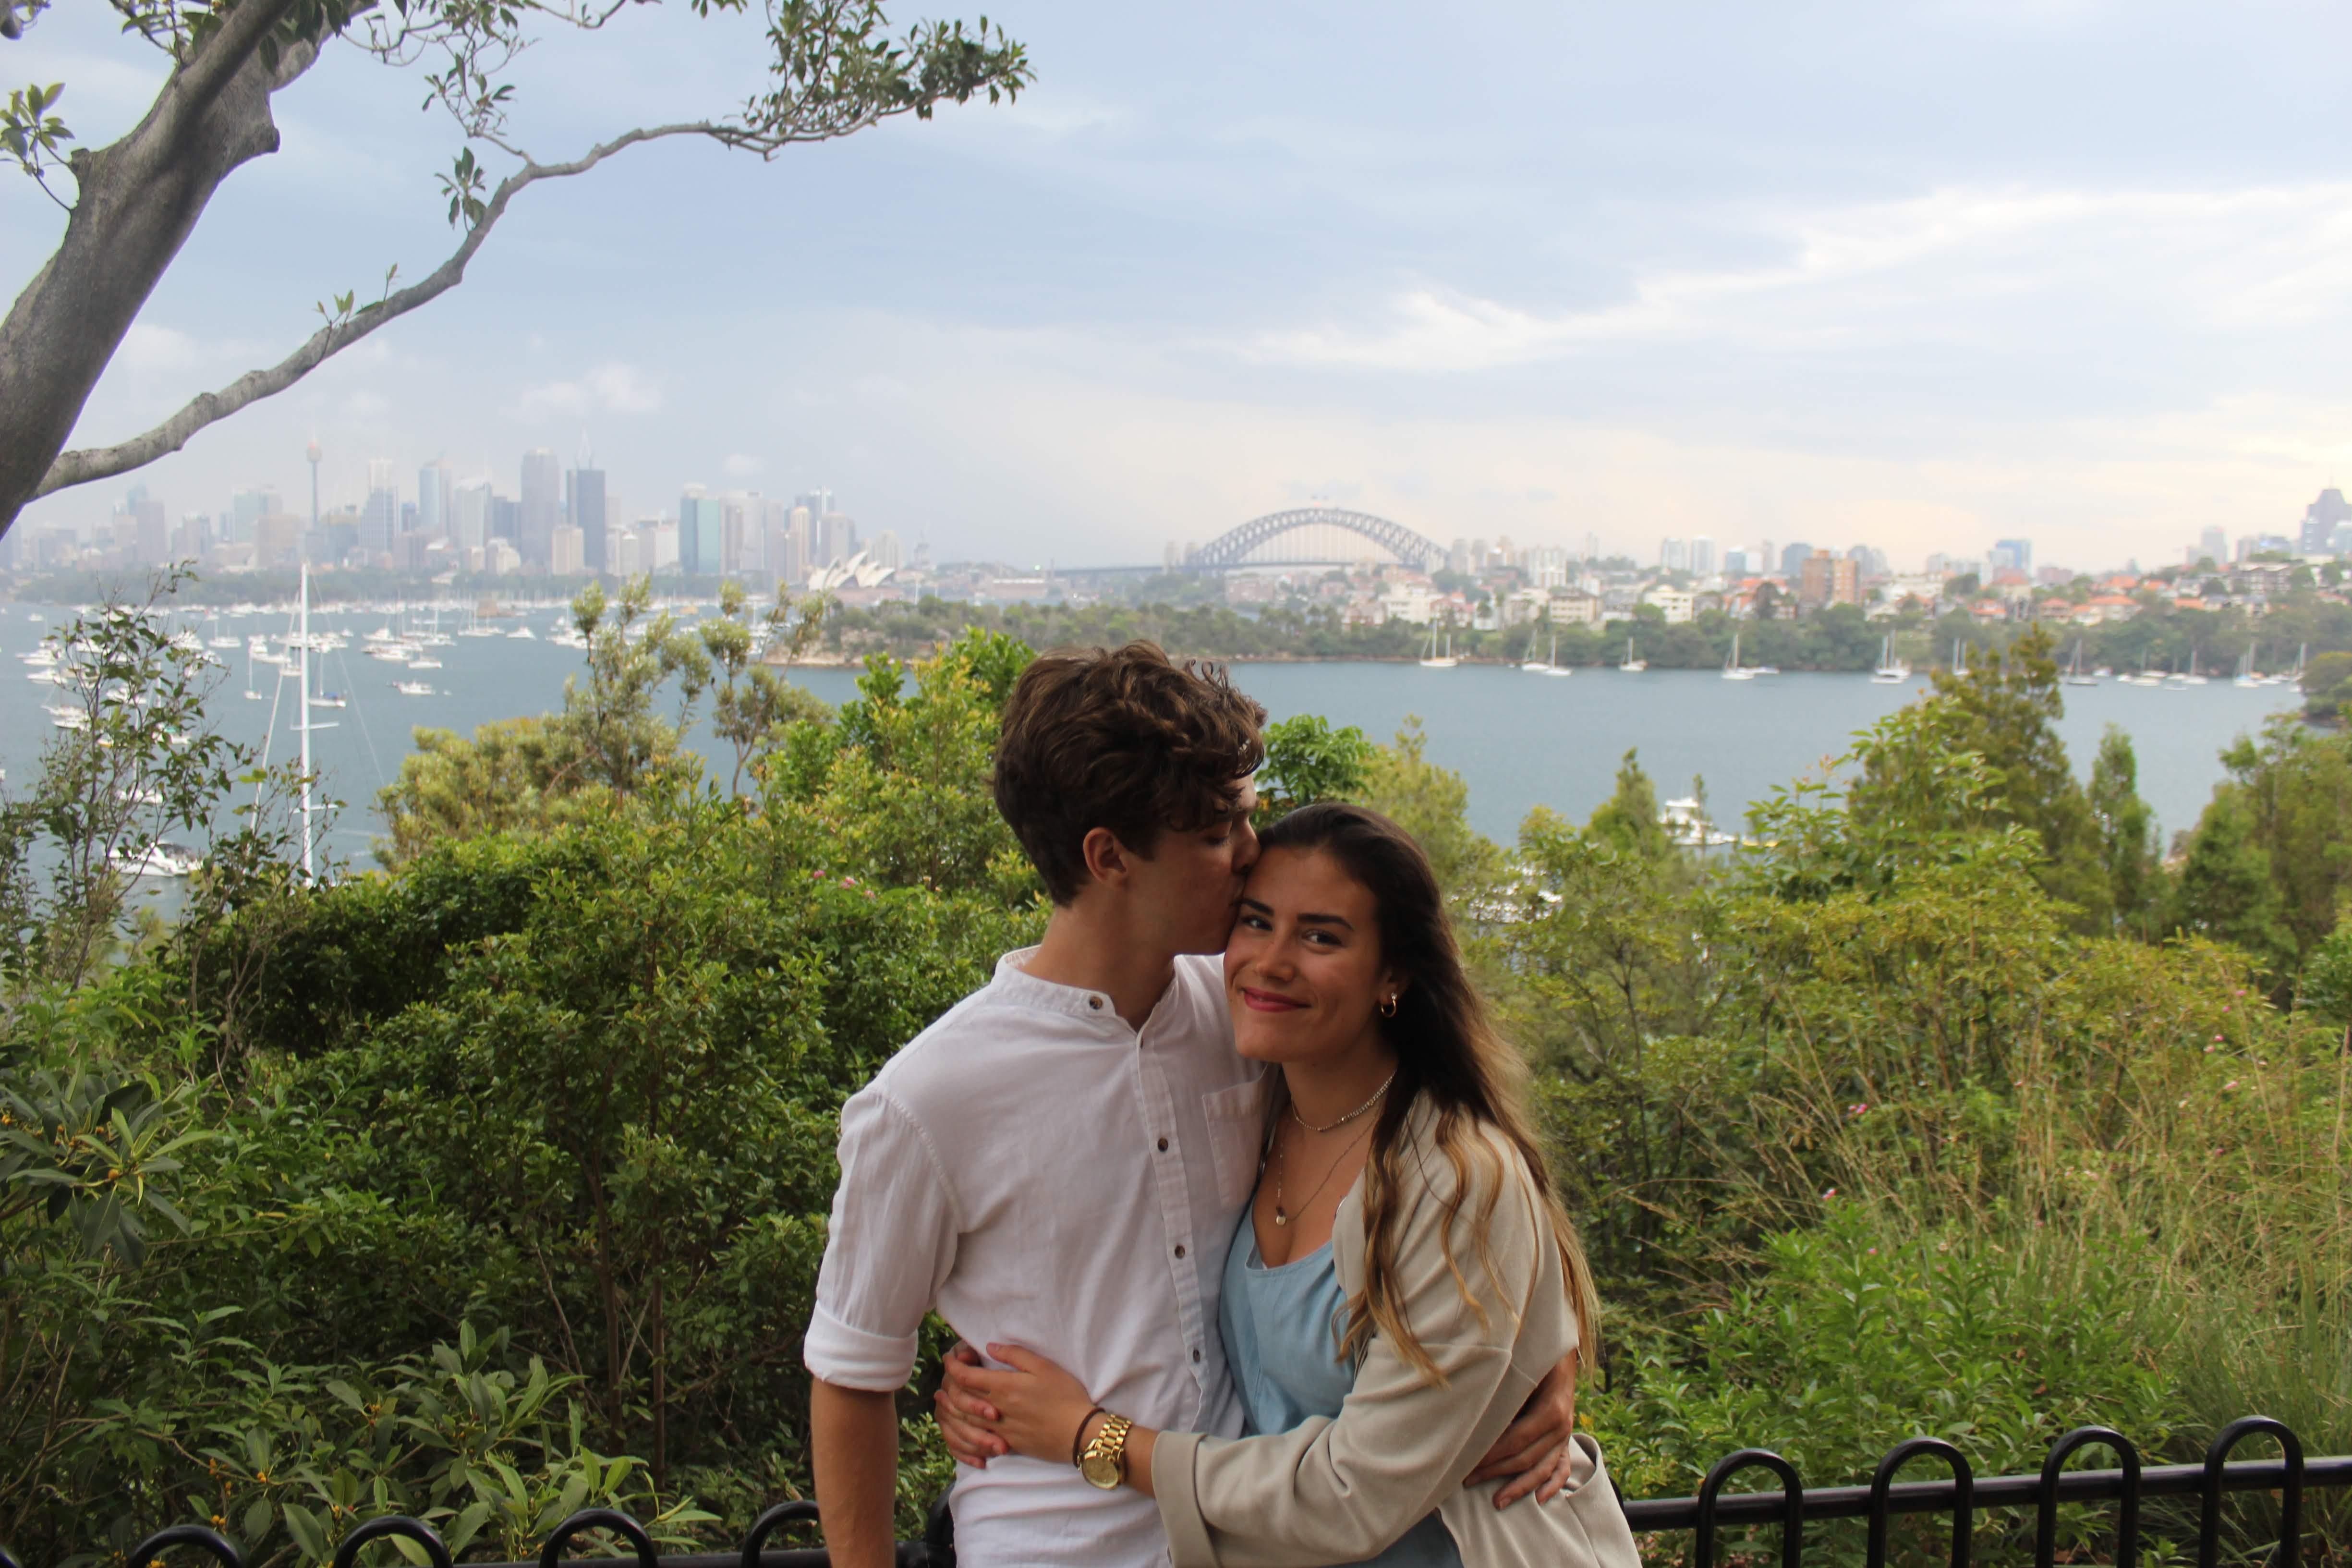 tatt ut dating show Australia hastighet dating Fairfield ca